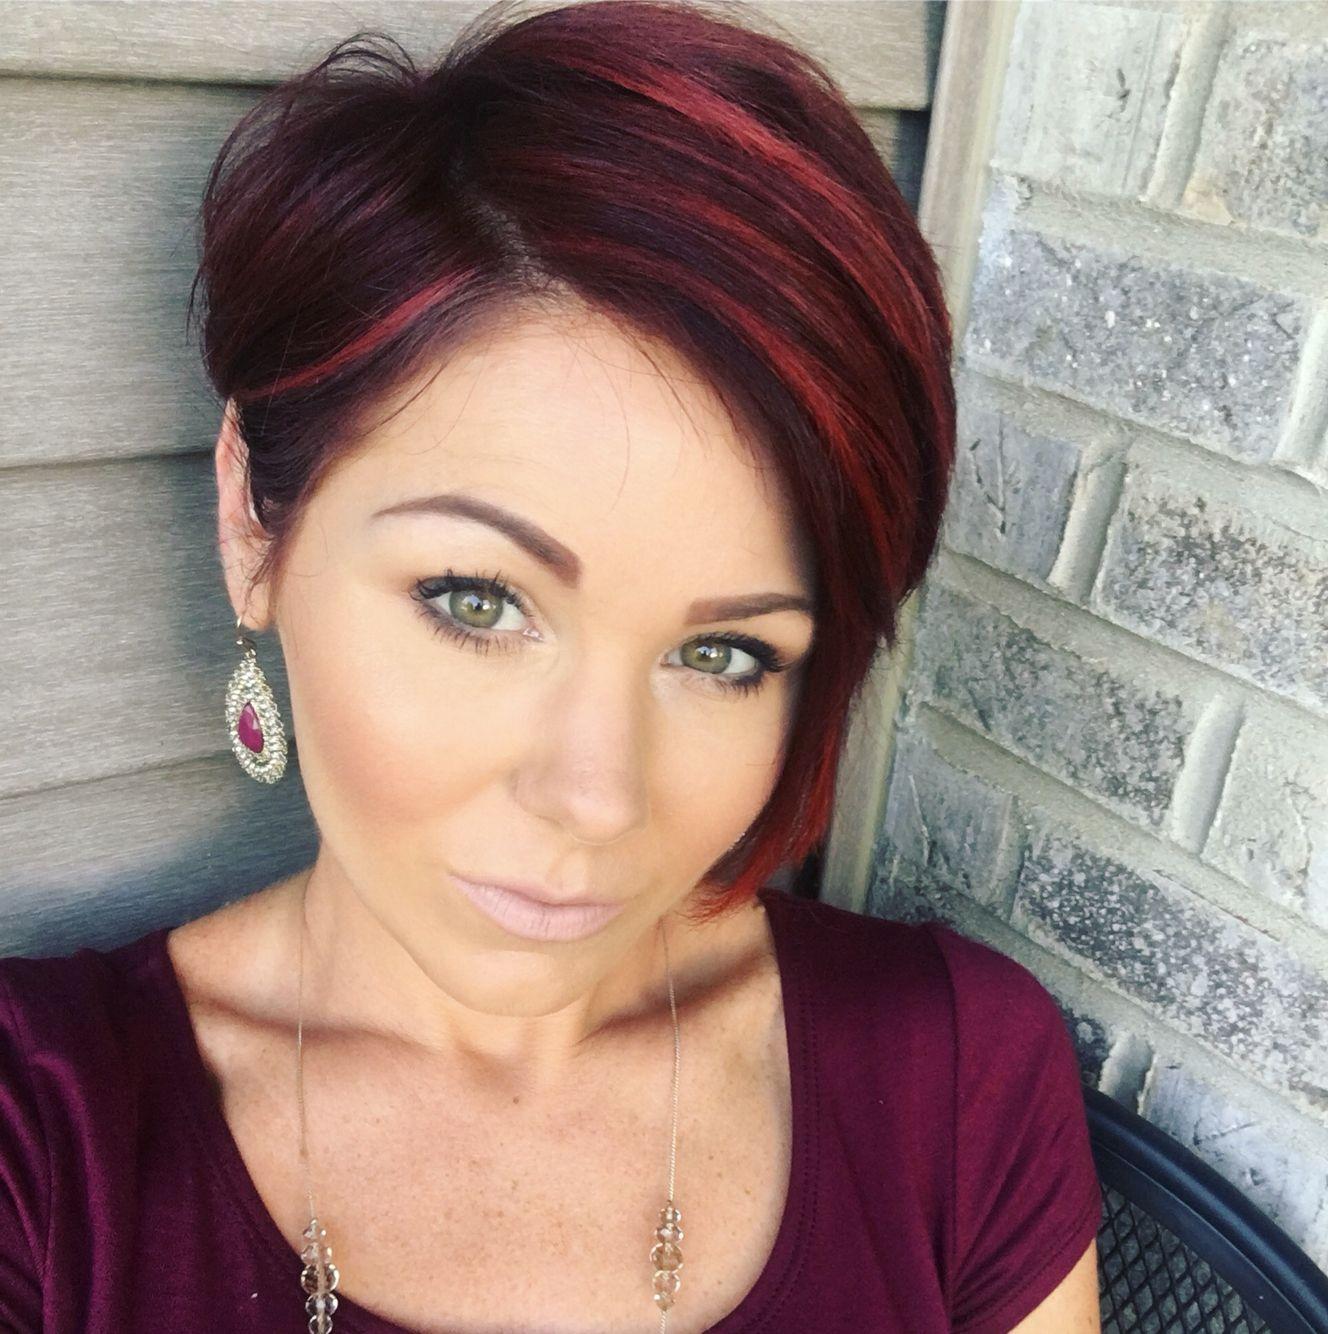 #redhair #pixie #shorthair